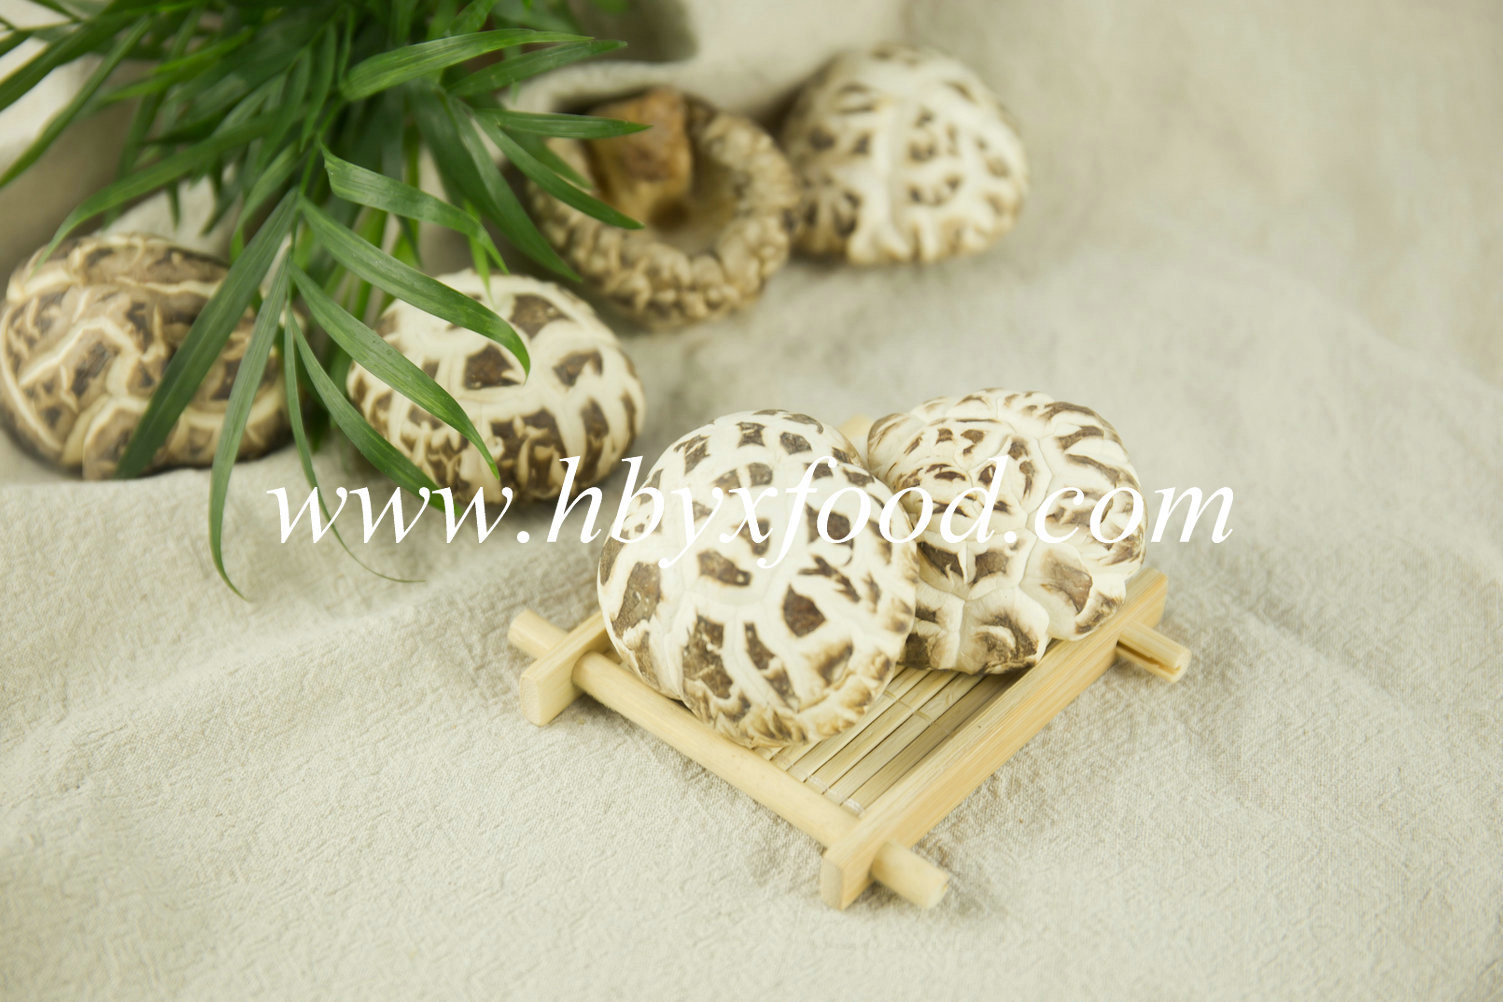 Dehydrated Flower Mushroom, China Shiitake Mushroom